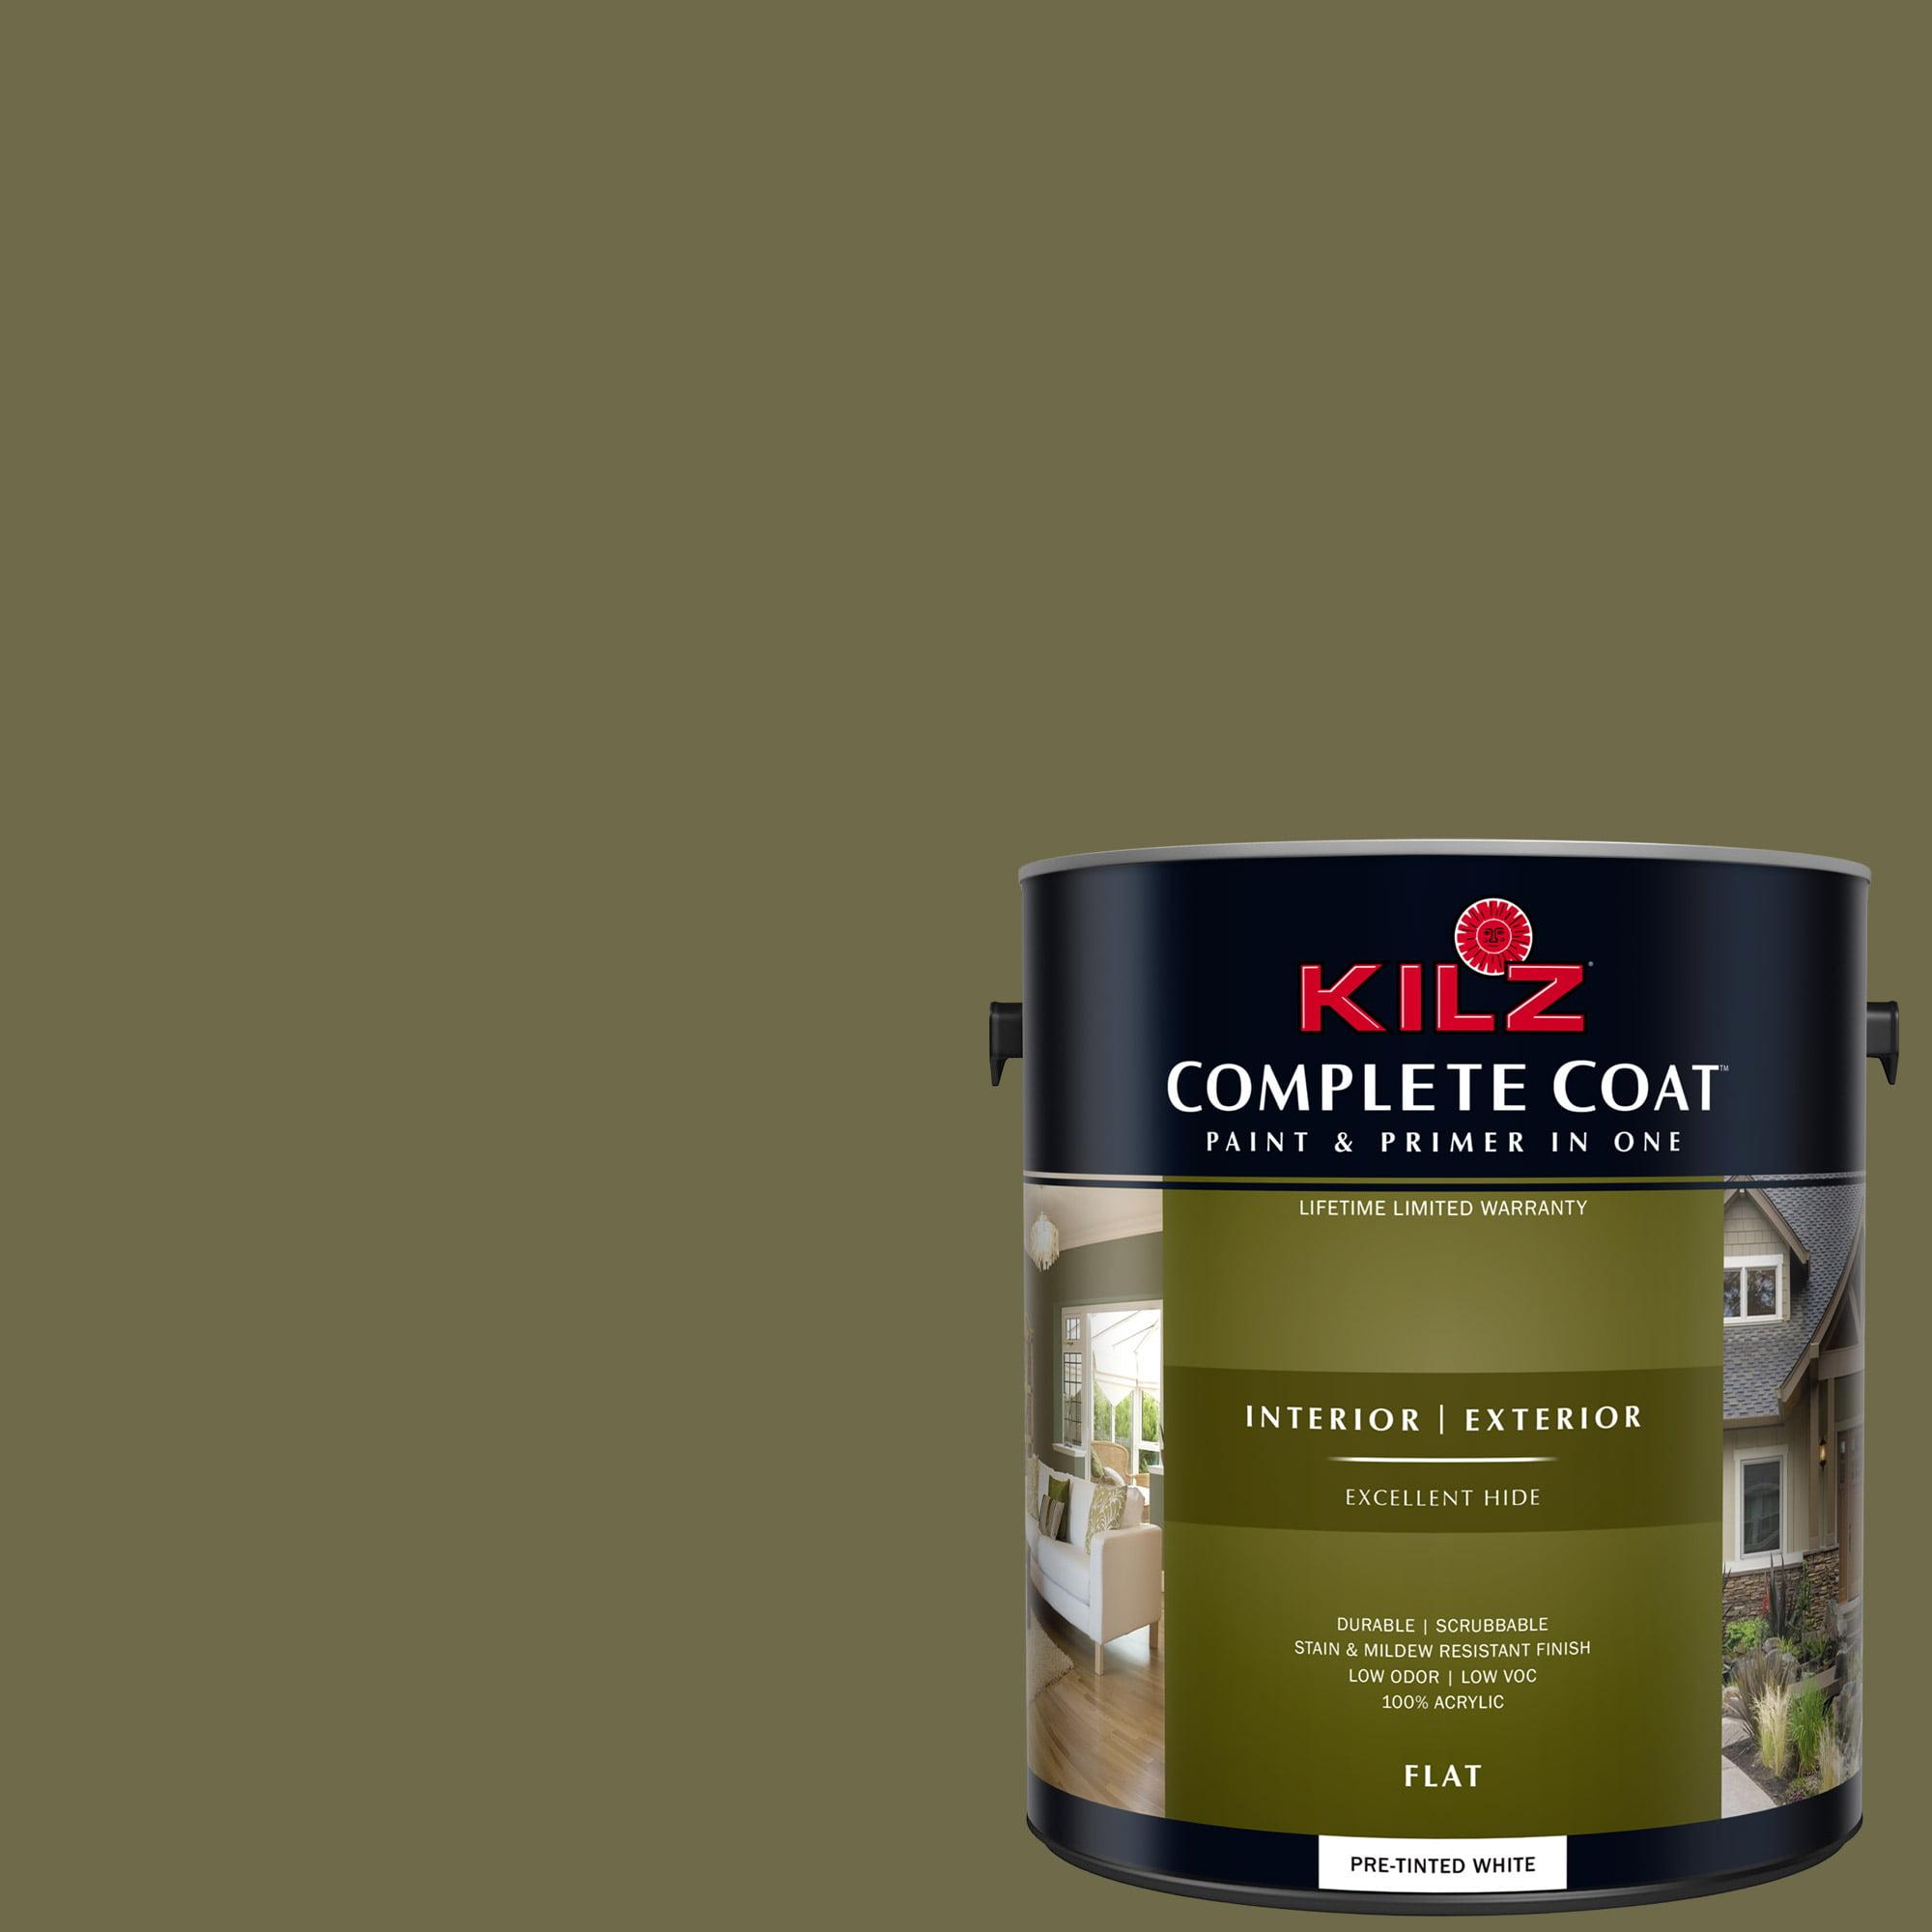 KILZ COMPLETE COAT Interior/Exterior Paint & Primer in One #LF110-02 Anchorage Jacket